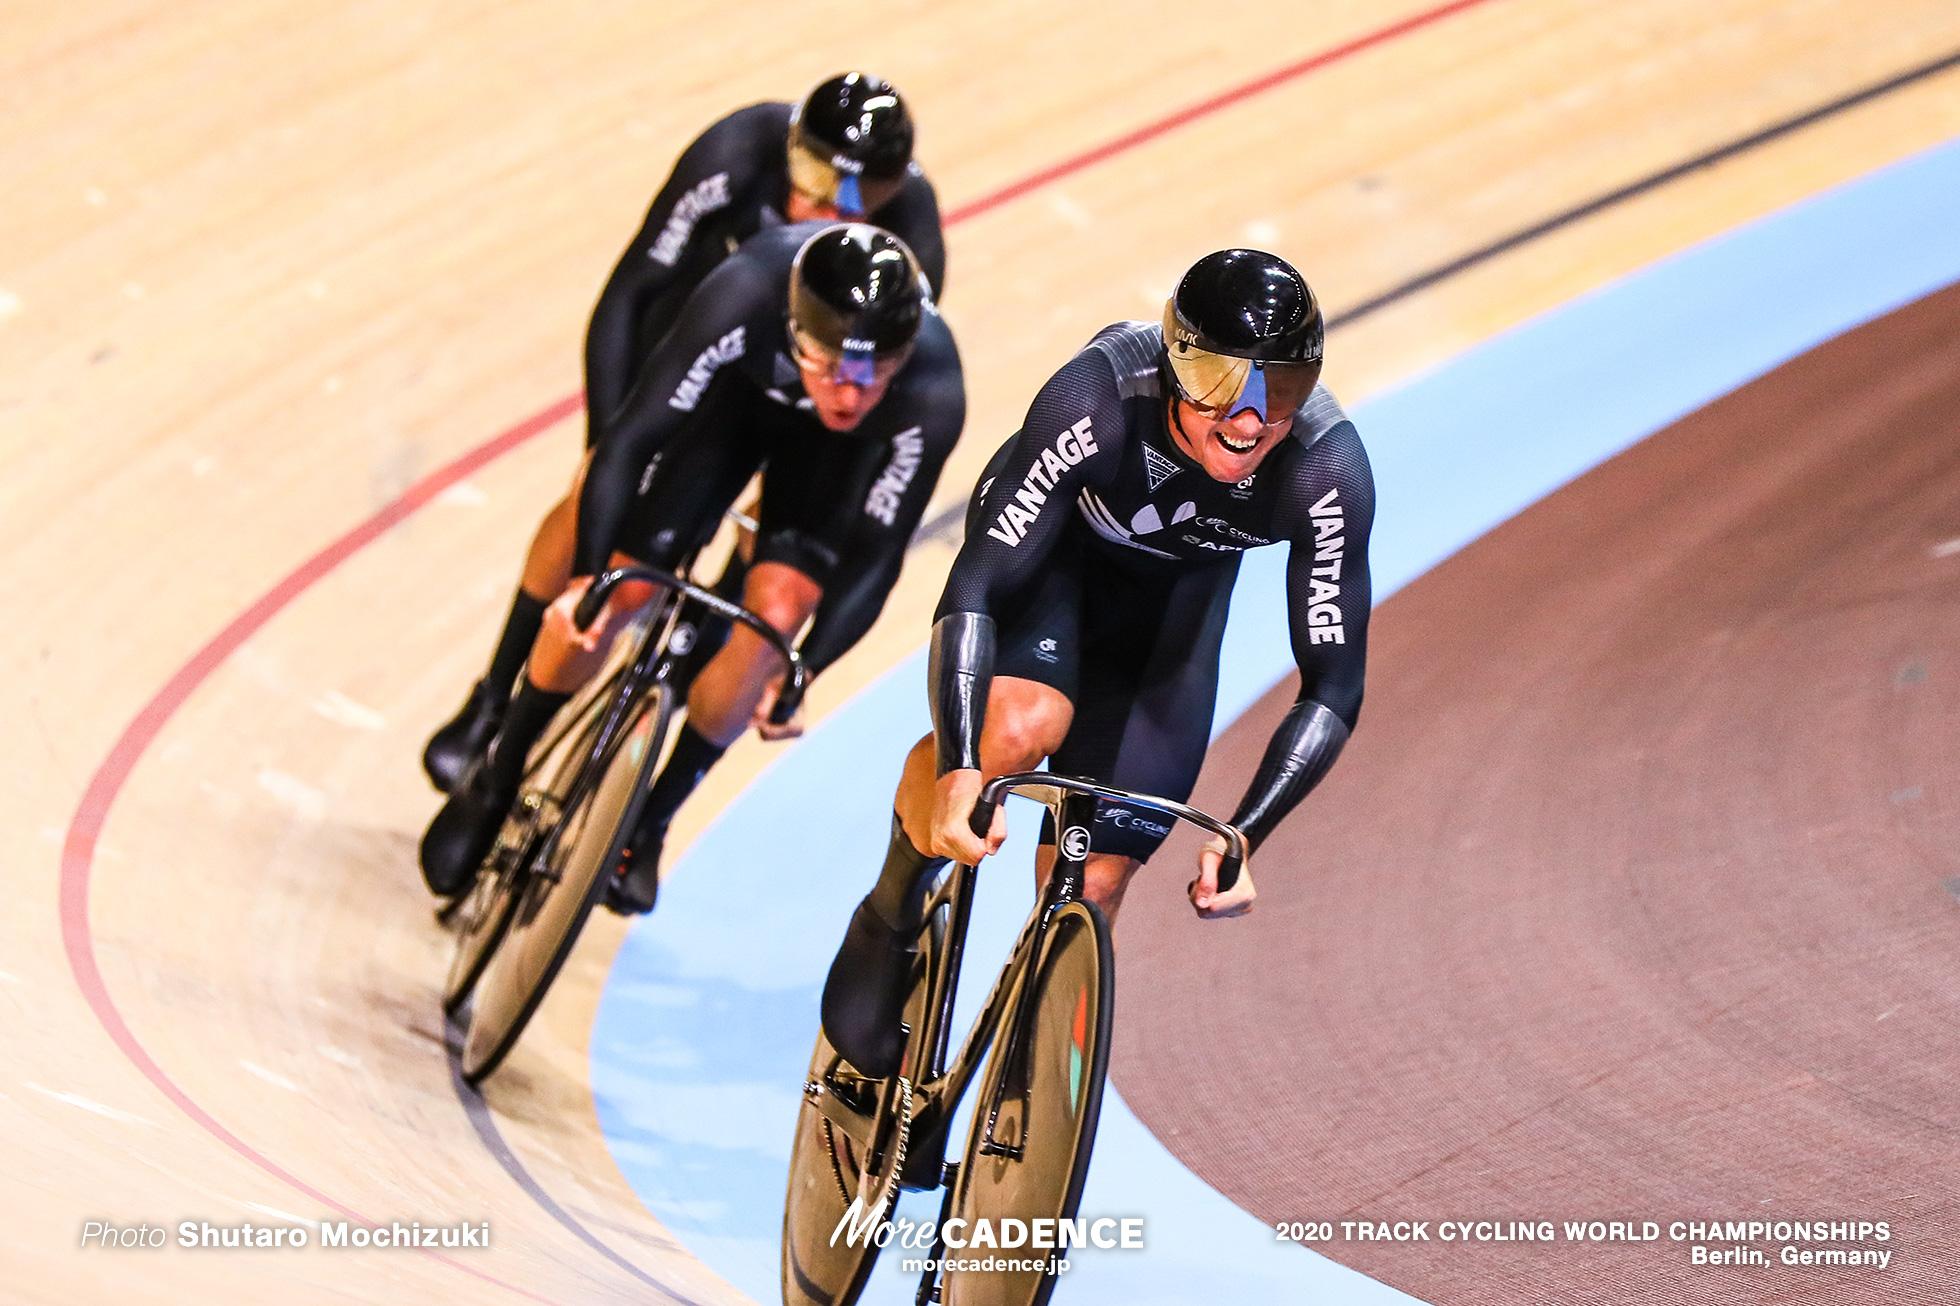 Qualifying / Men's Team Sprint / 2020 Track Cycling World Championships